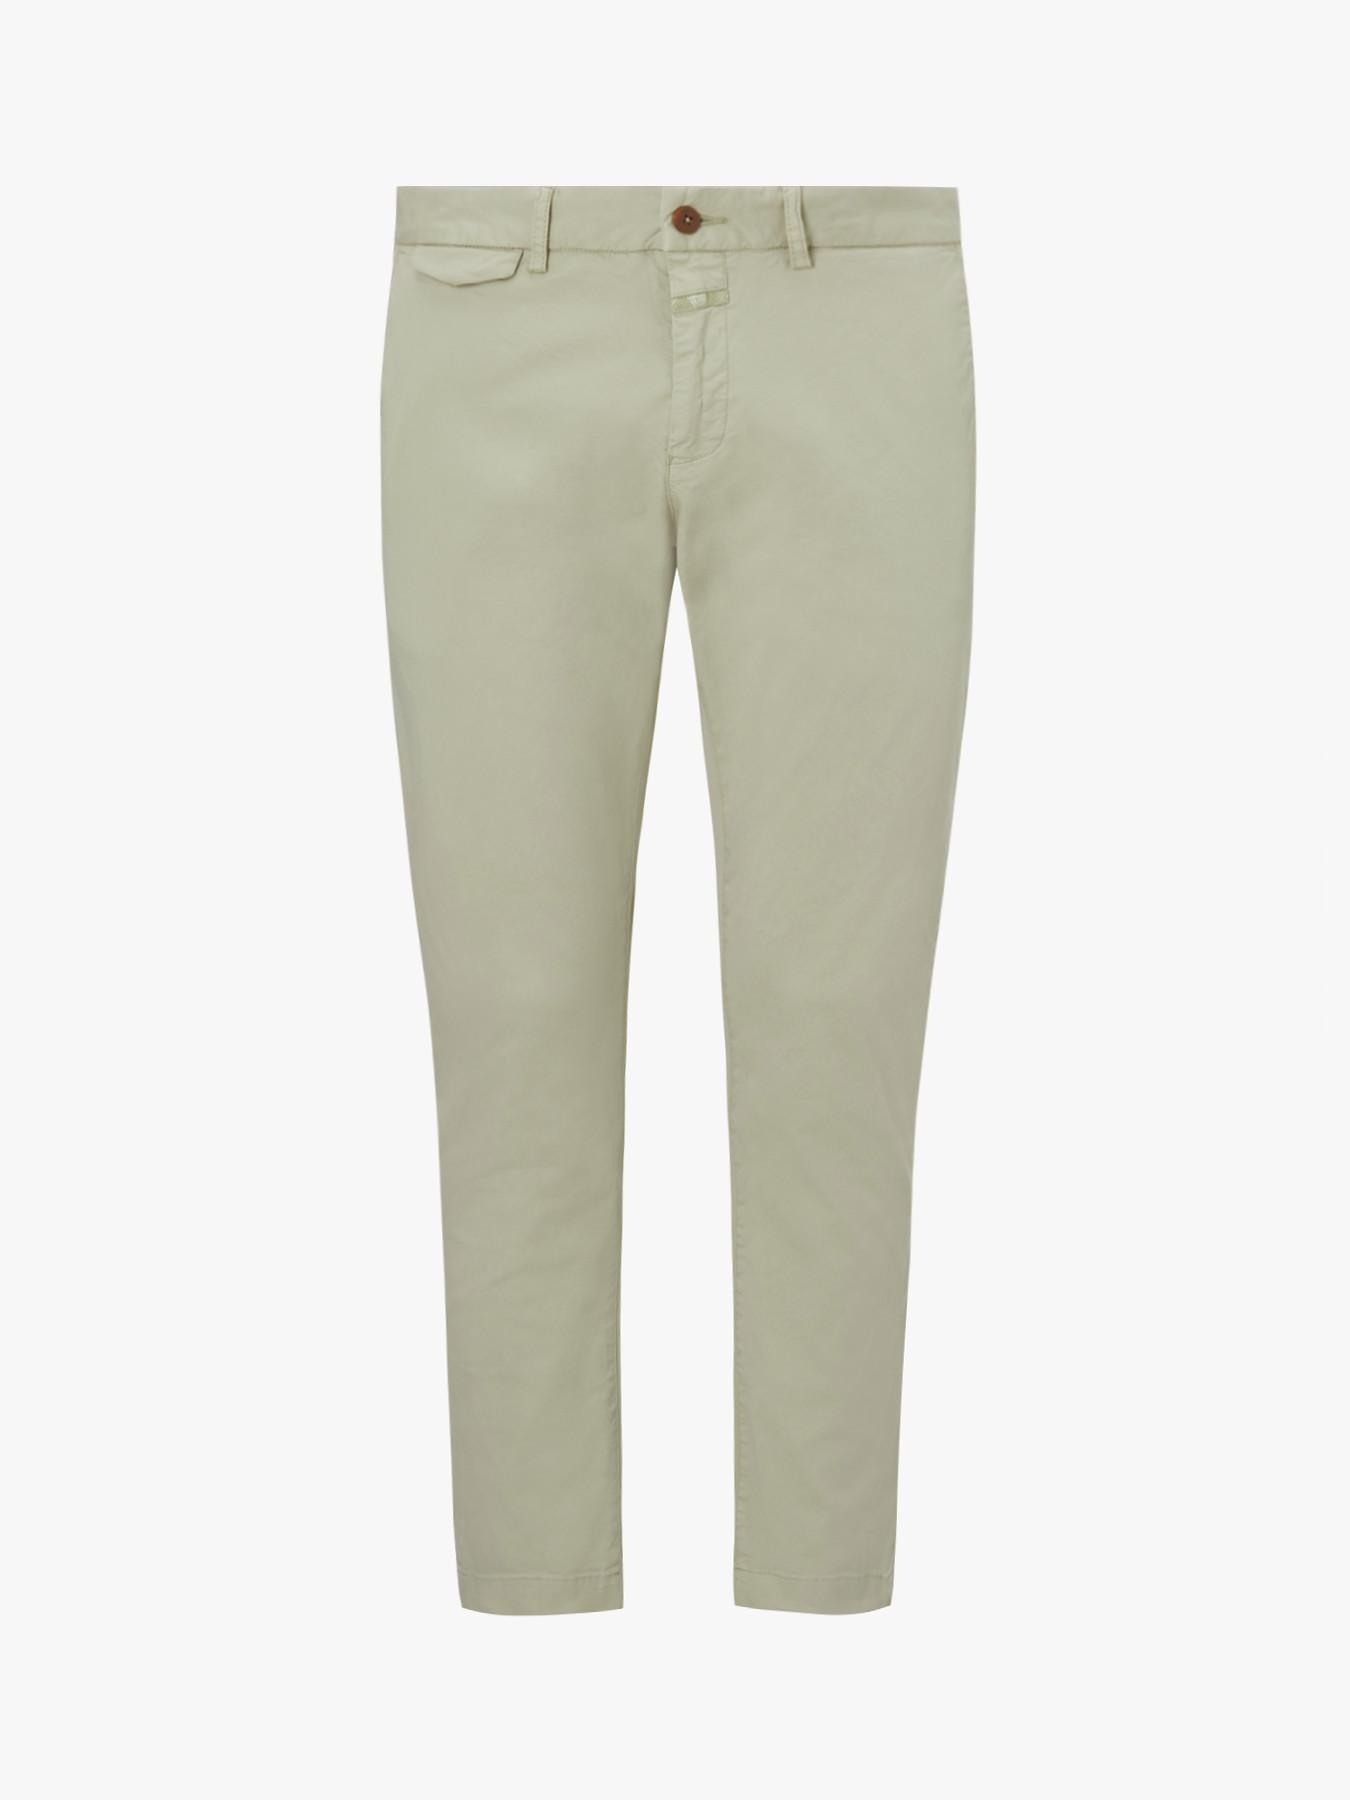 pantaloni compressione adidas